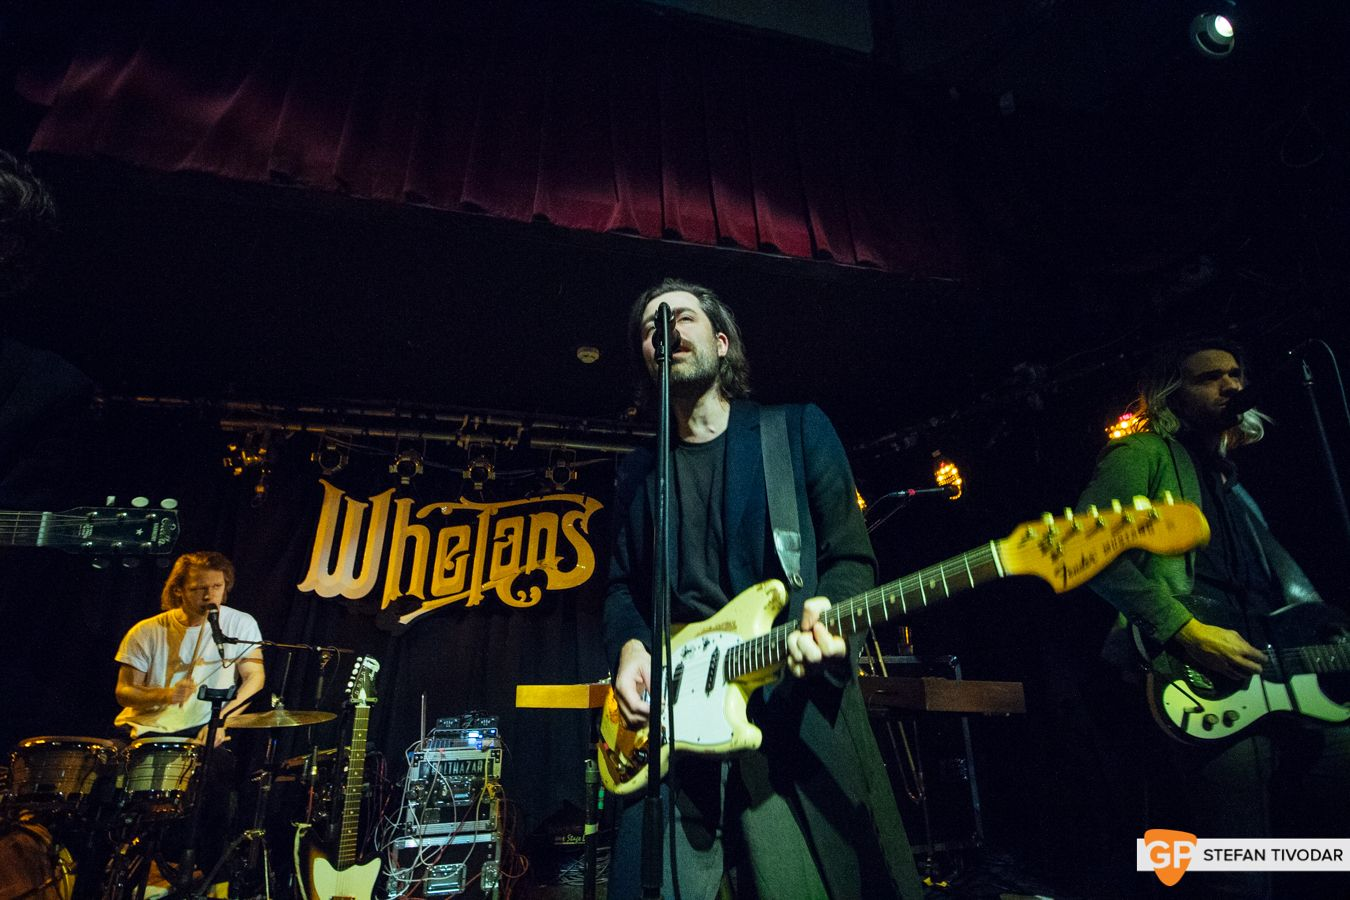 Balthazar Whelans Feb 2019 Tivodar 8